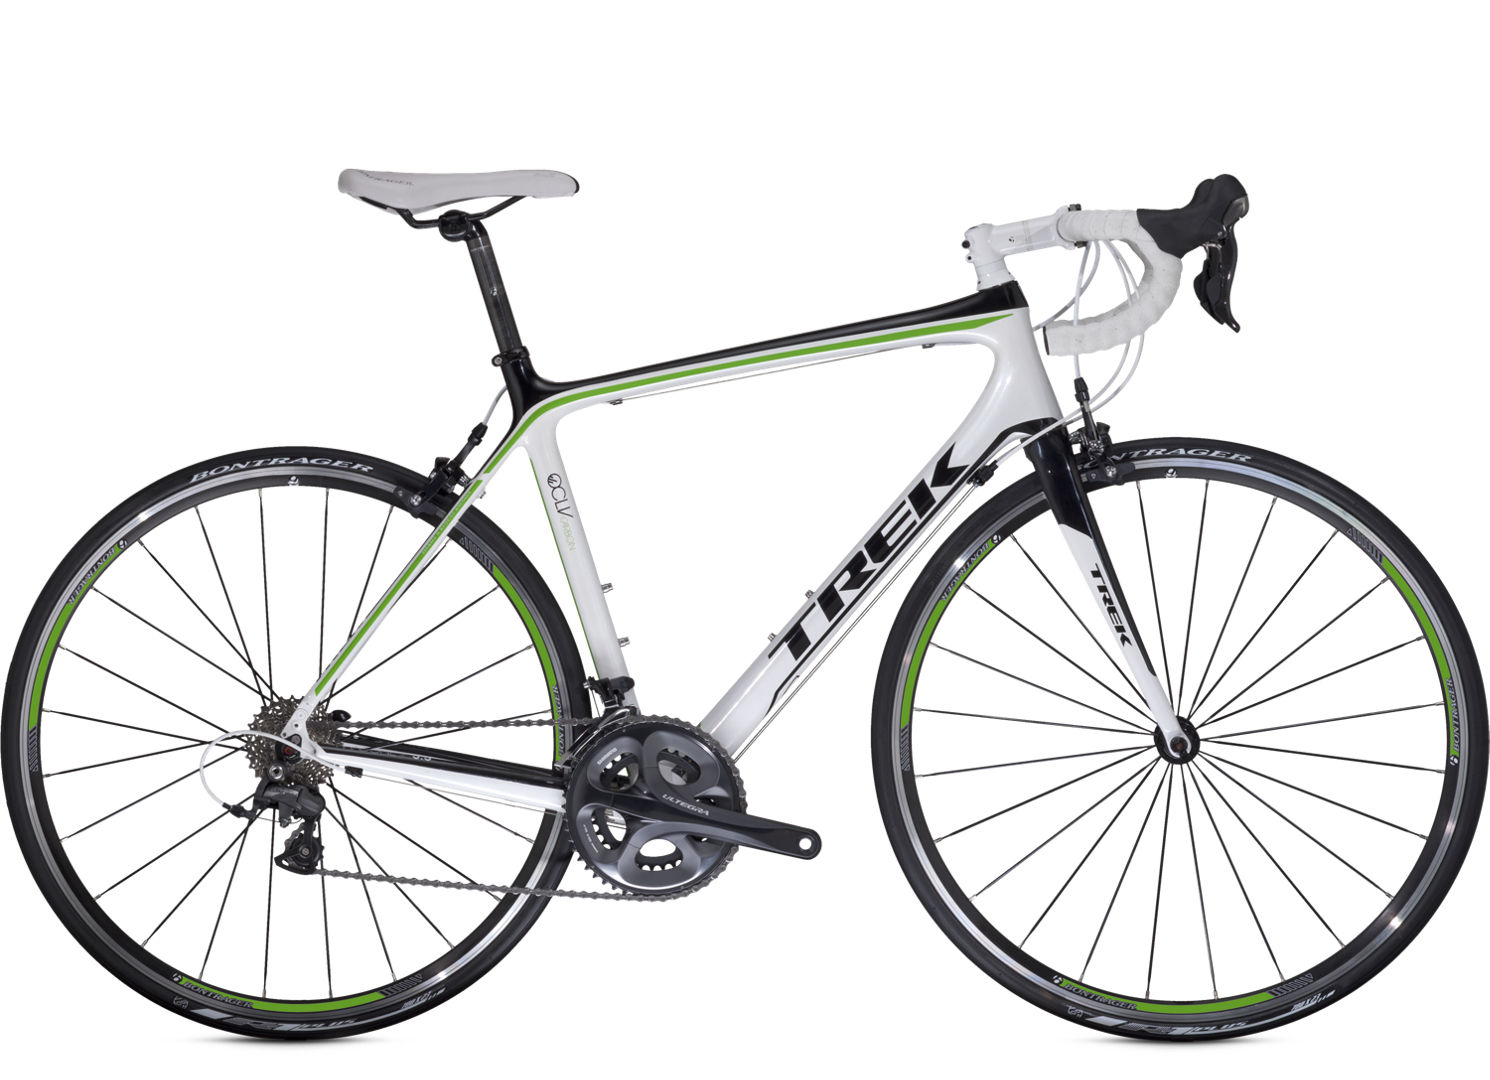 Bicicletas Carretera ~ Moto Quad Infantes